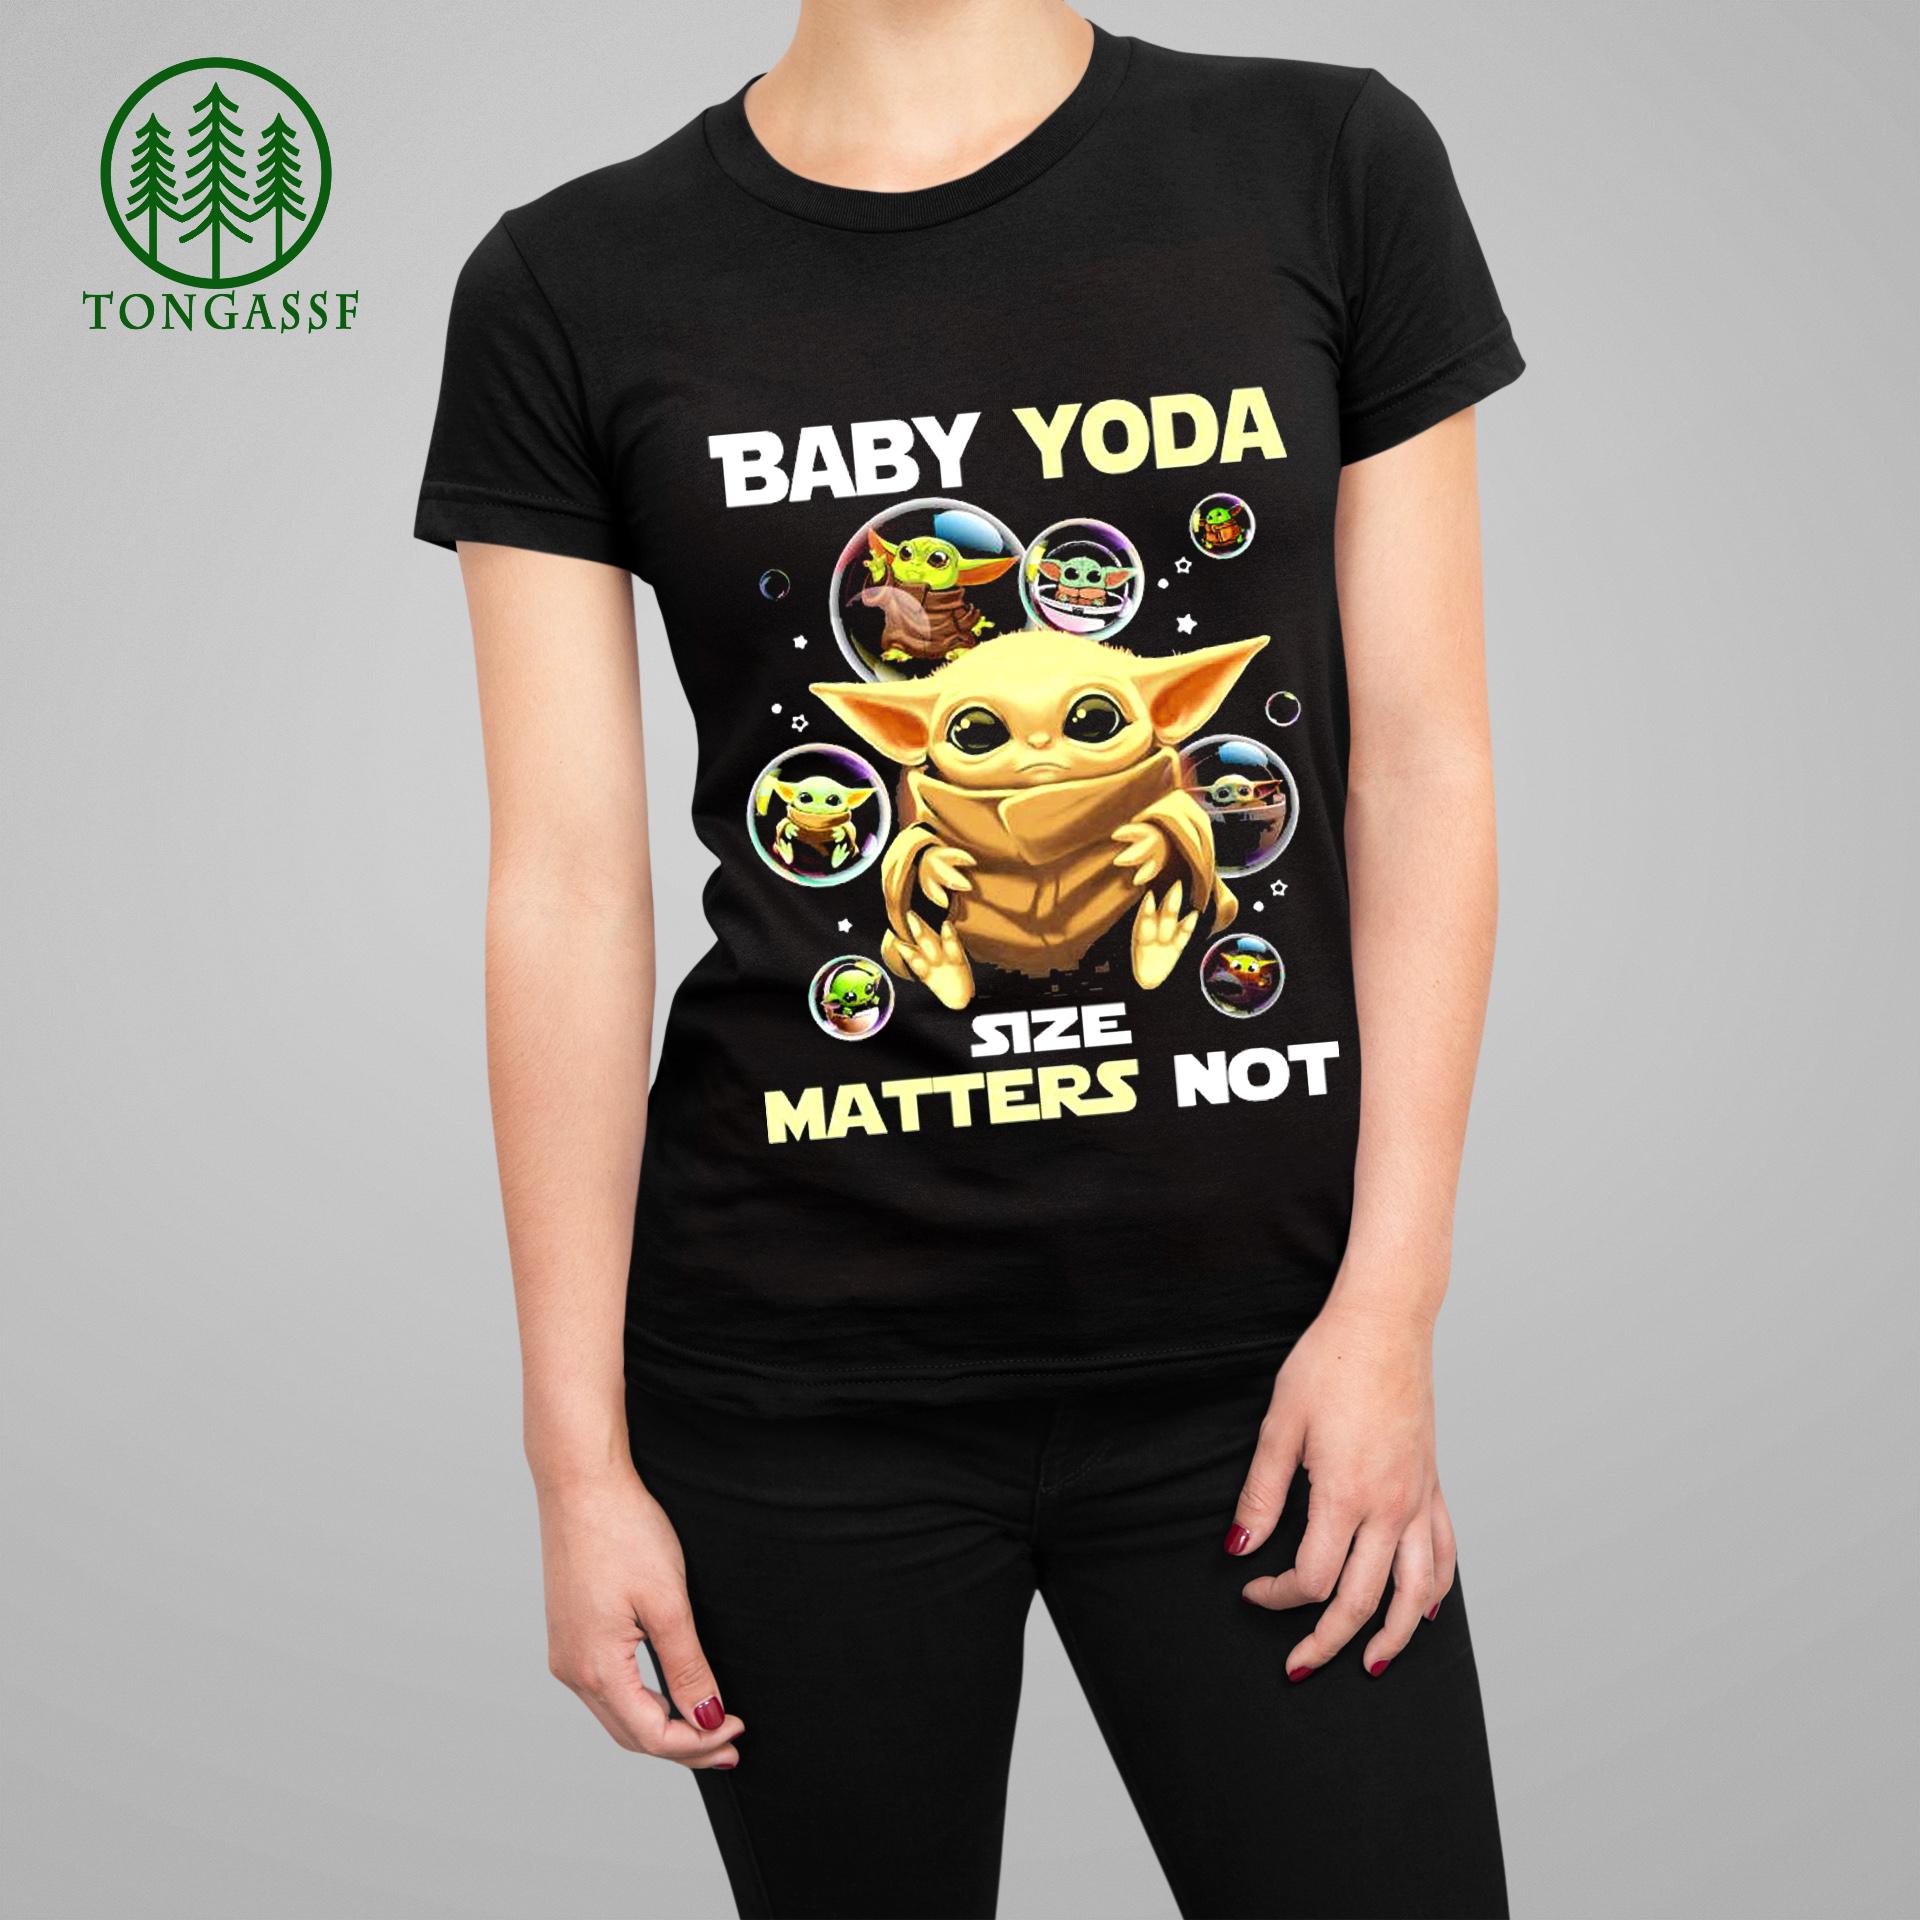 Baby Yoda balloons size matters not shirt